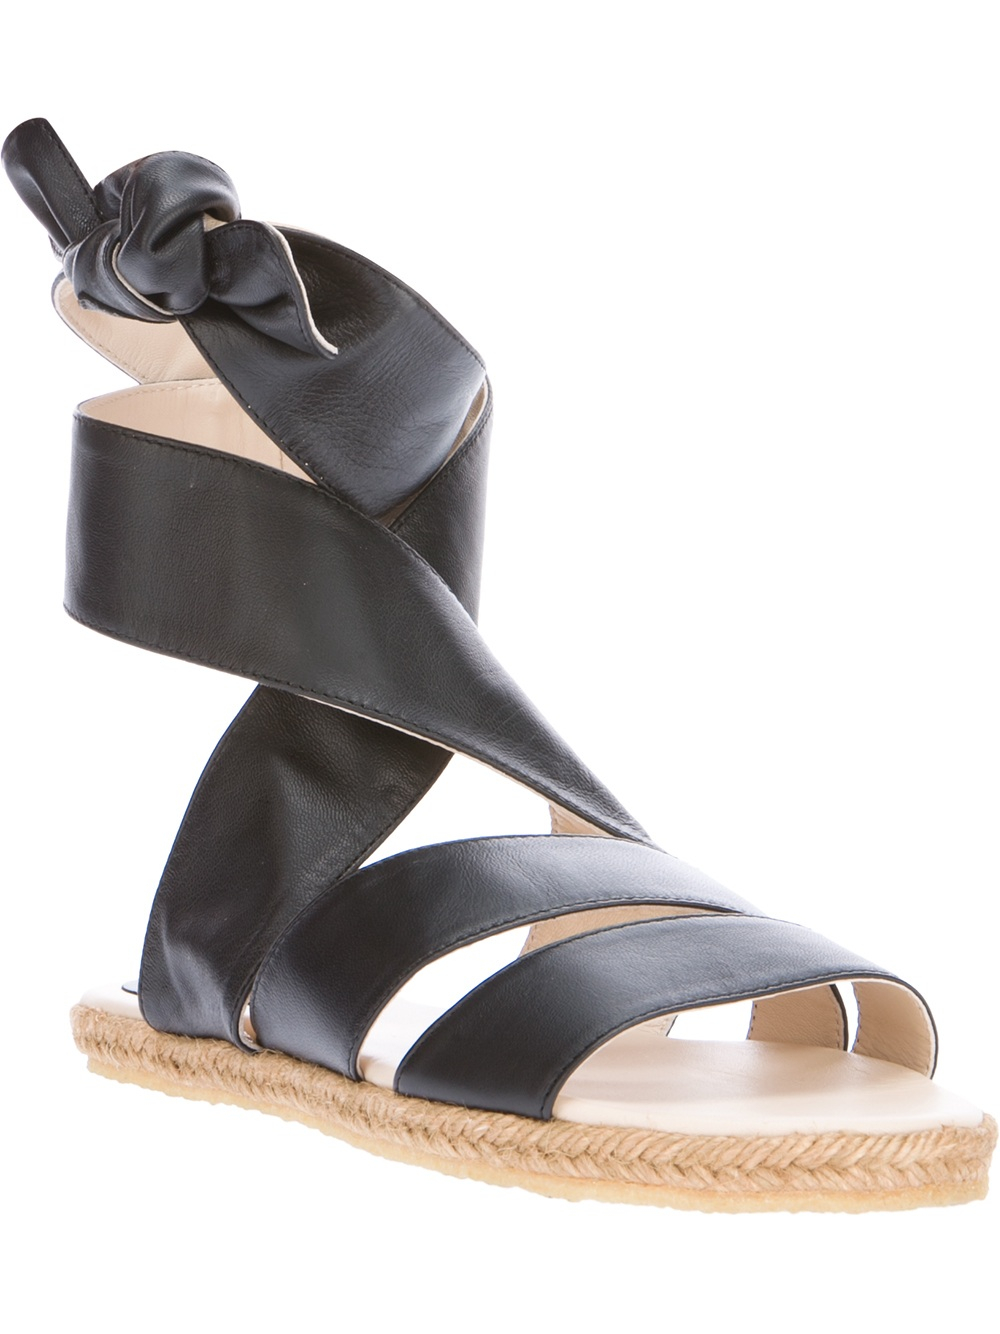 Black ribbon sandals - Gallery